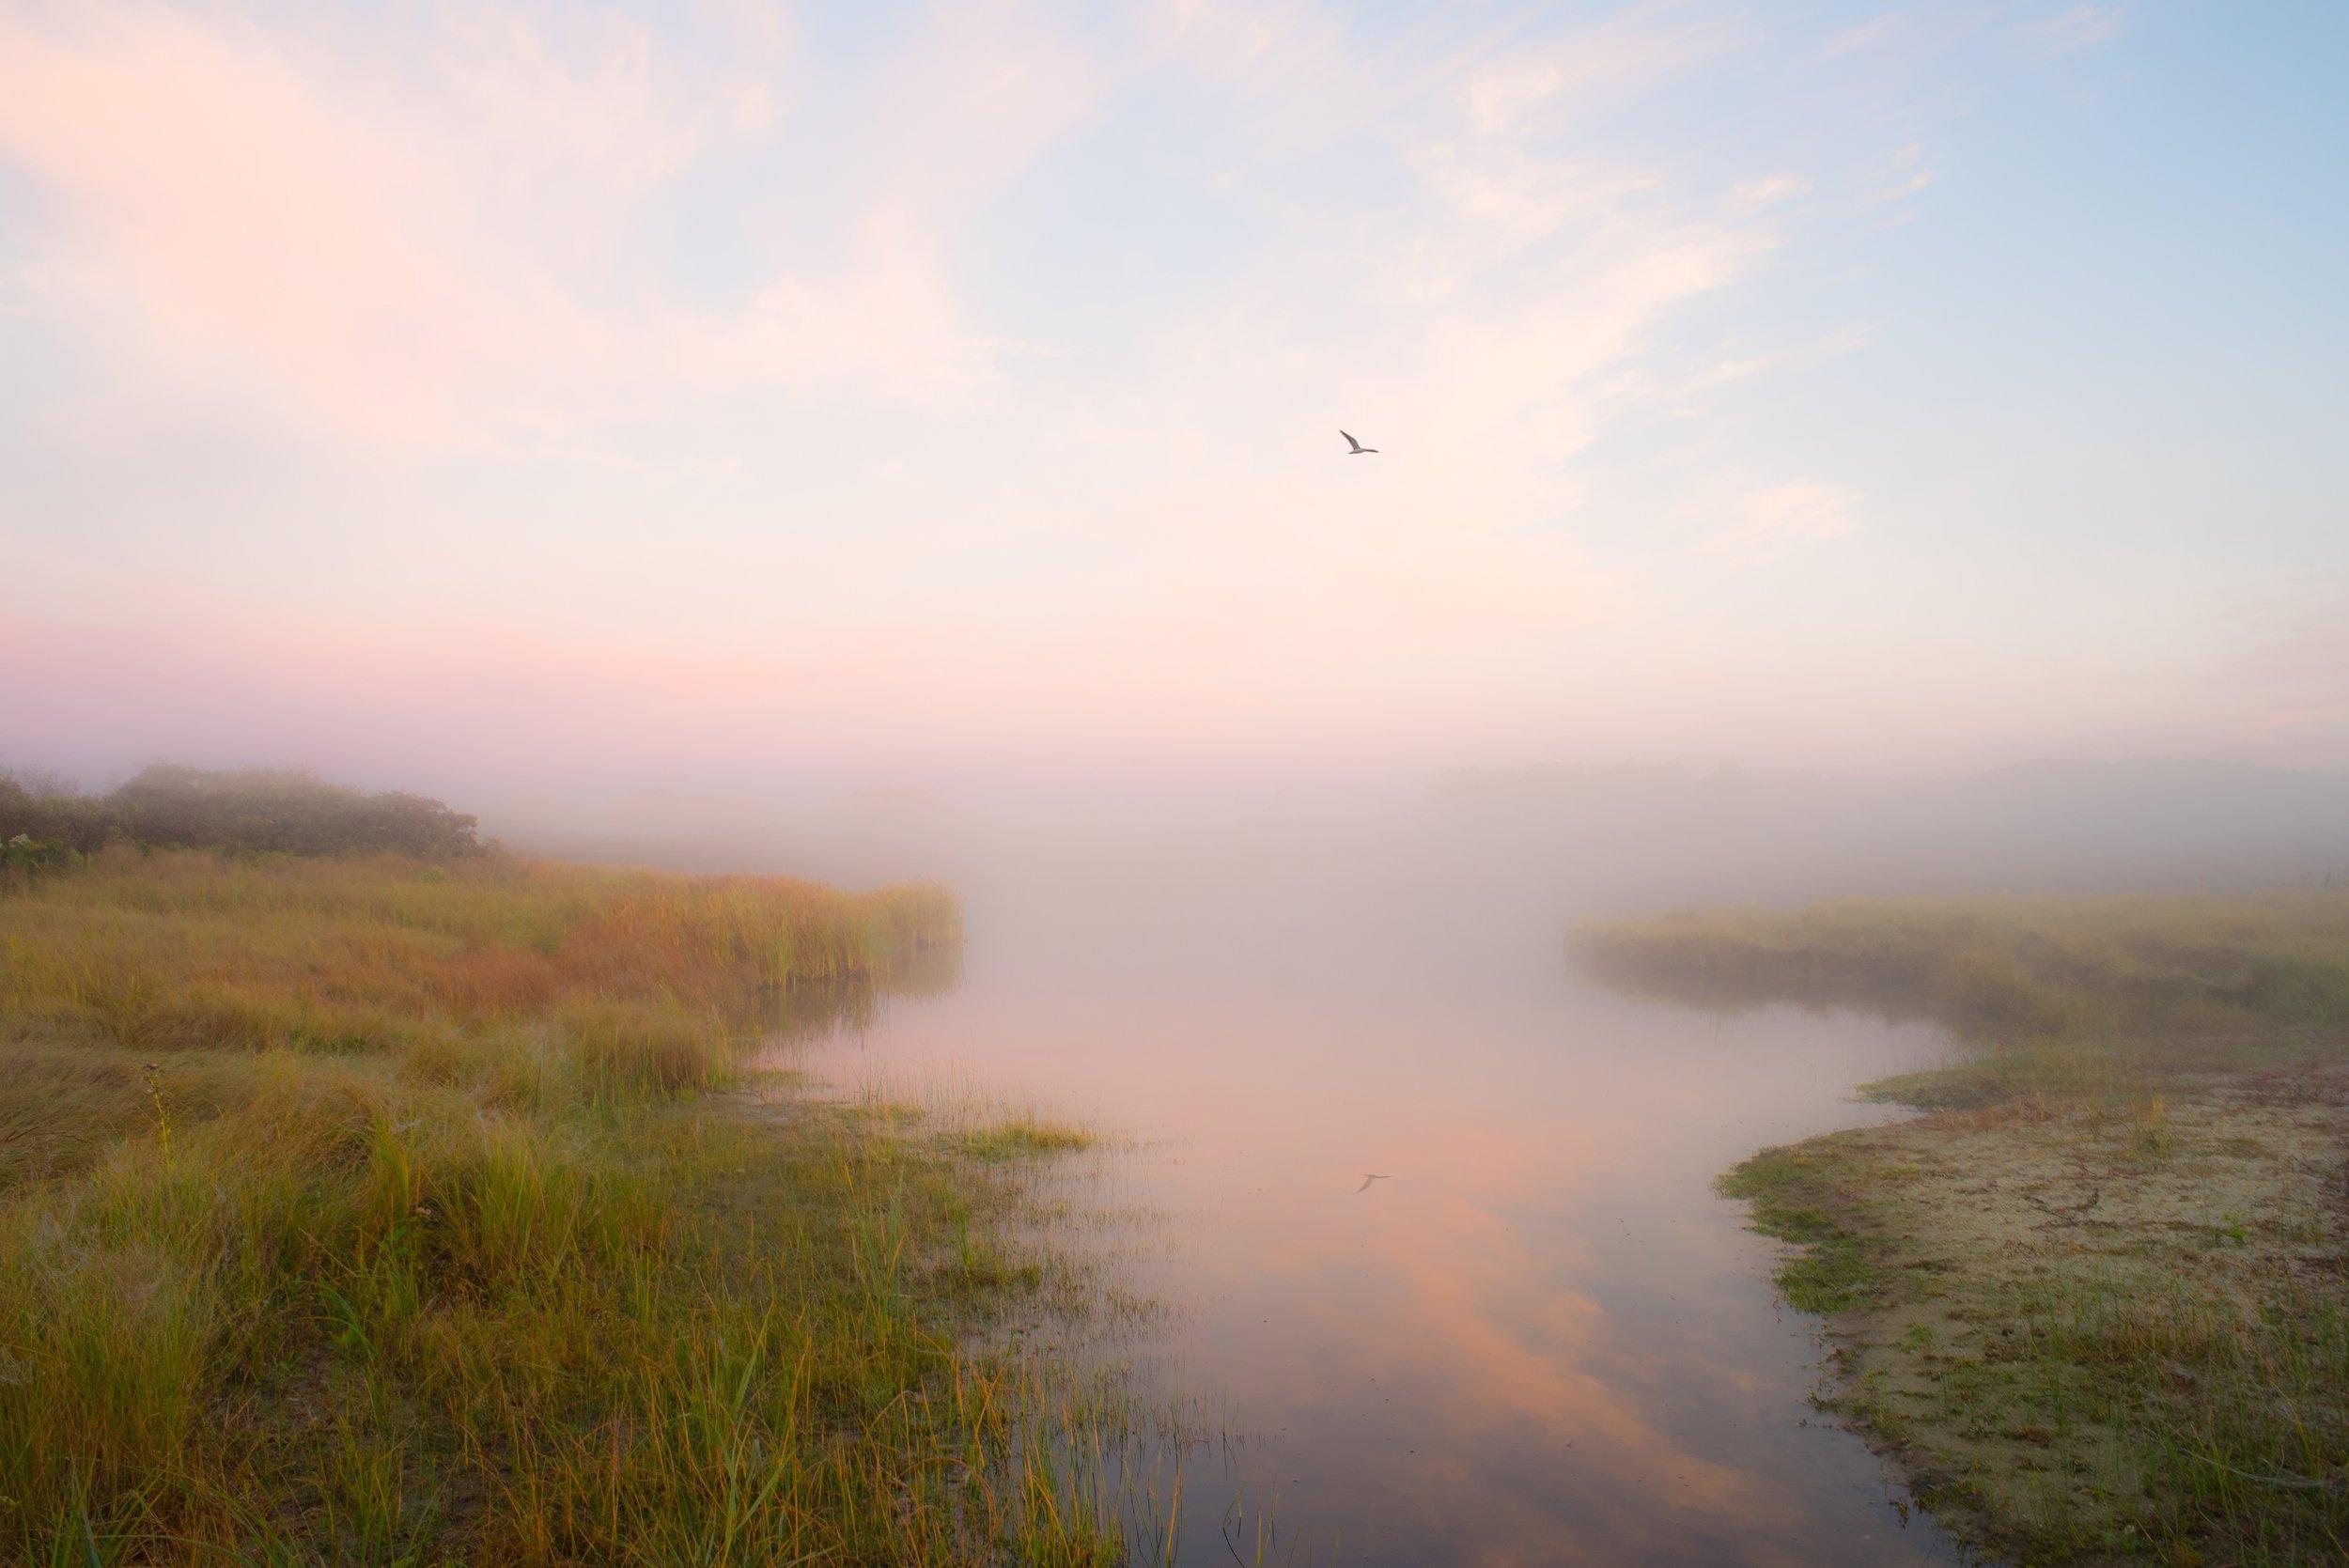 Sesachacha Creek I - Pink mist